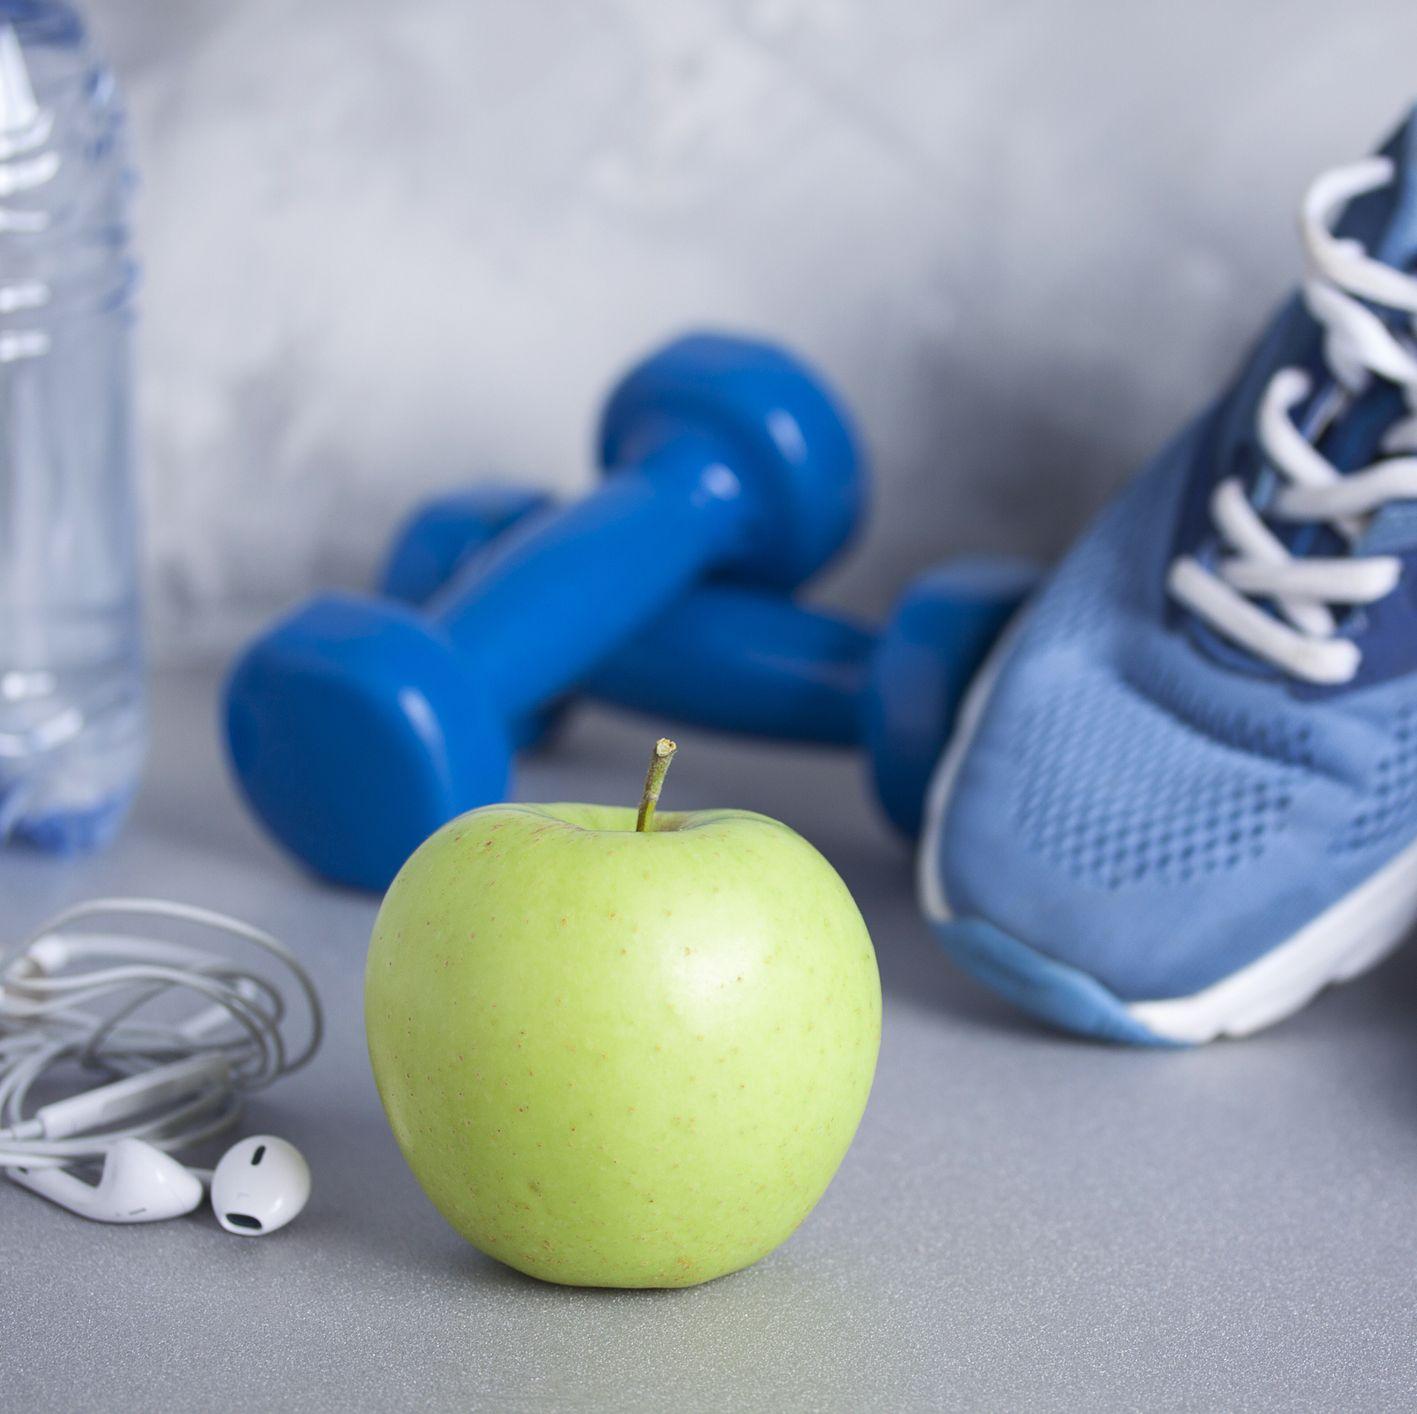 Sport shoes, dumbbells, earphones, apple, bottle of water, concrete background